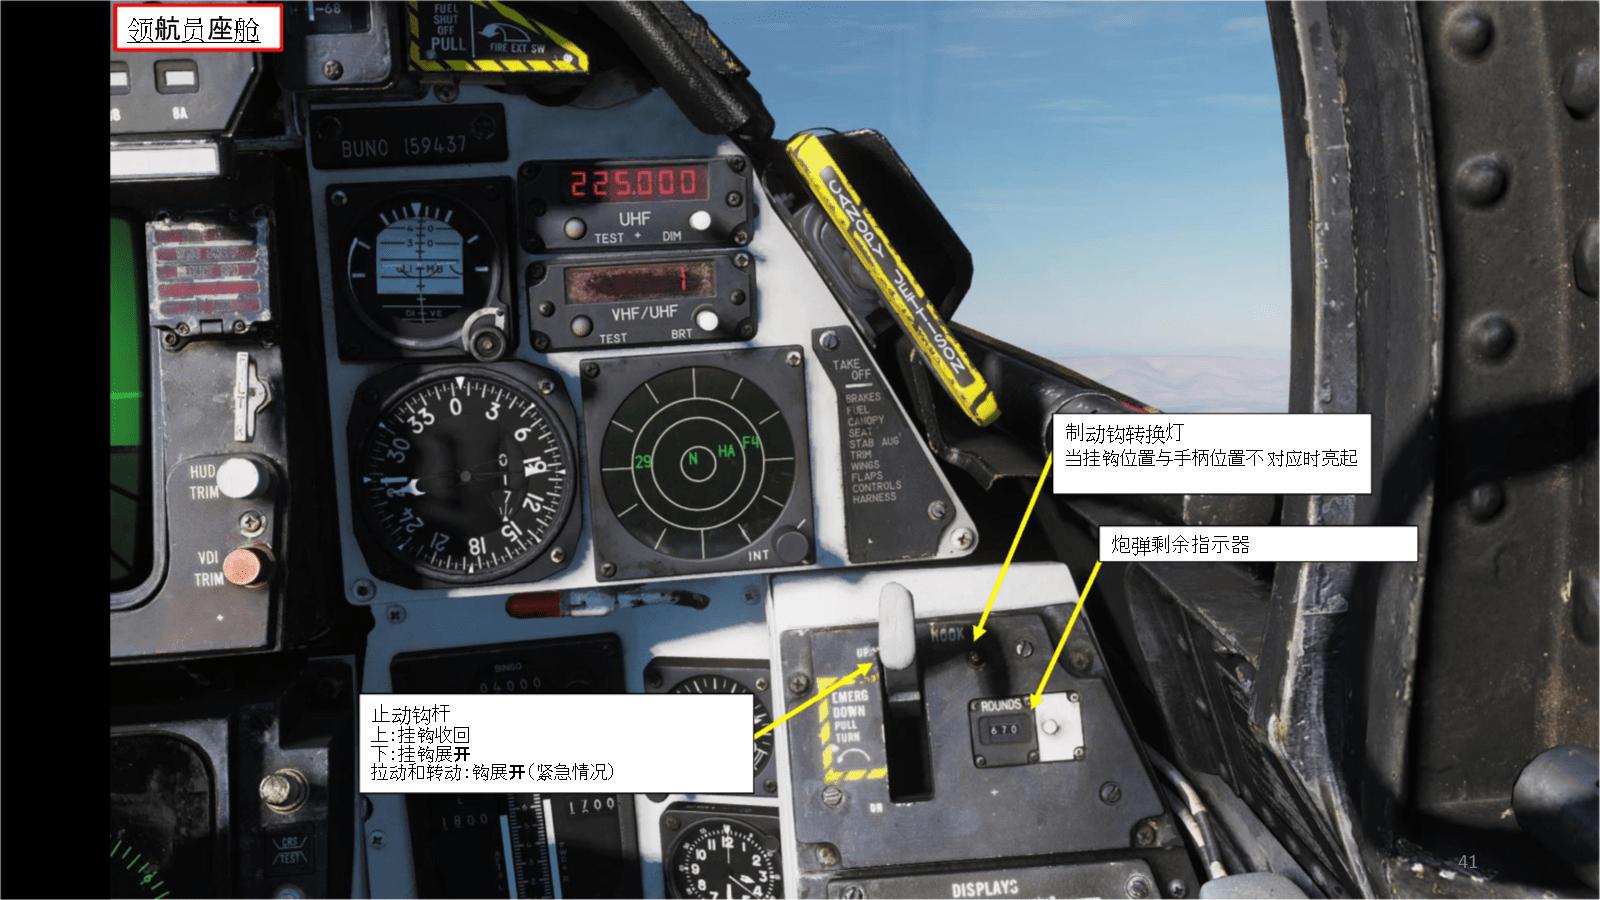 DCS F-14B Tomcat熊猫战斗机 中文指南3.1.1.2领航员座舱前面板.docx